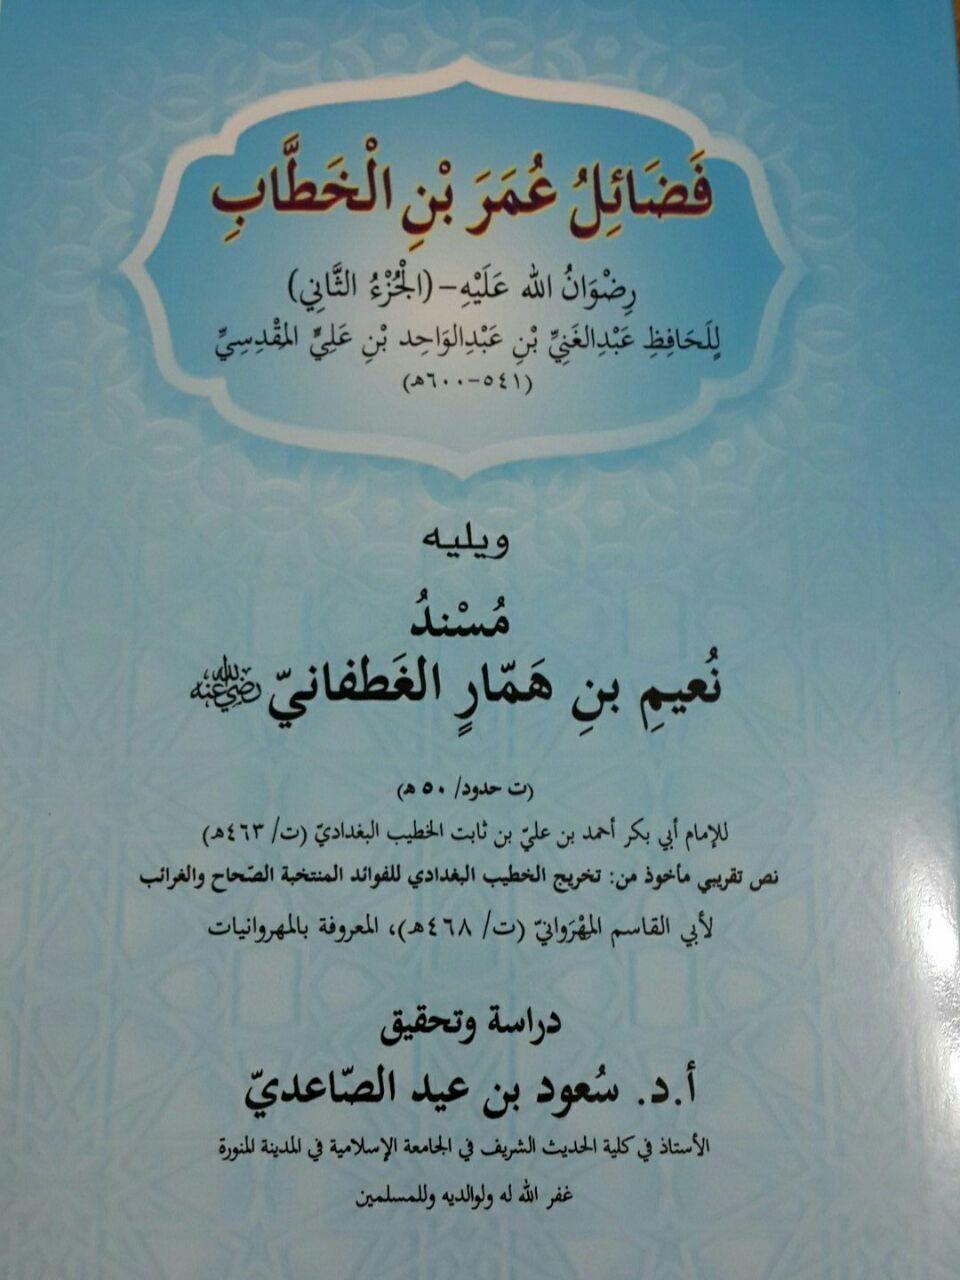 Pin By Taalib Al Ilm Educational Reso On Taalib Beneficial Arabic Books Free Ebooks Download Books Books Free Download Pdf Arabic Books